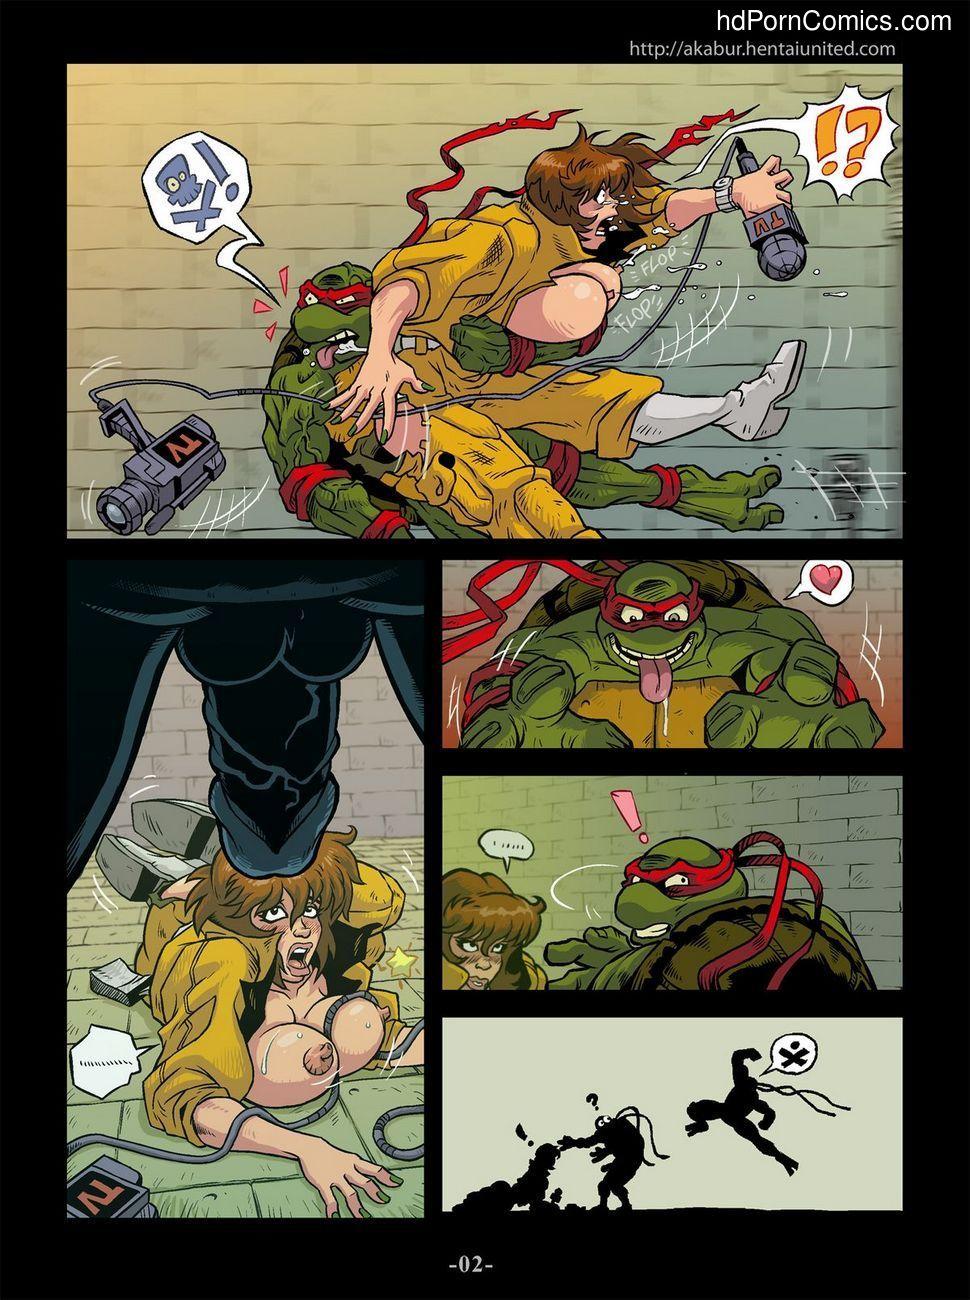 Порно черепашки ниндзя комикс на русском